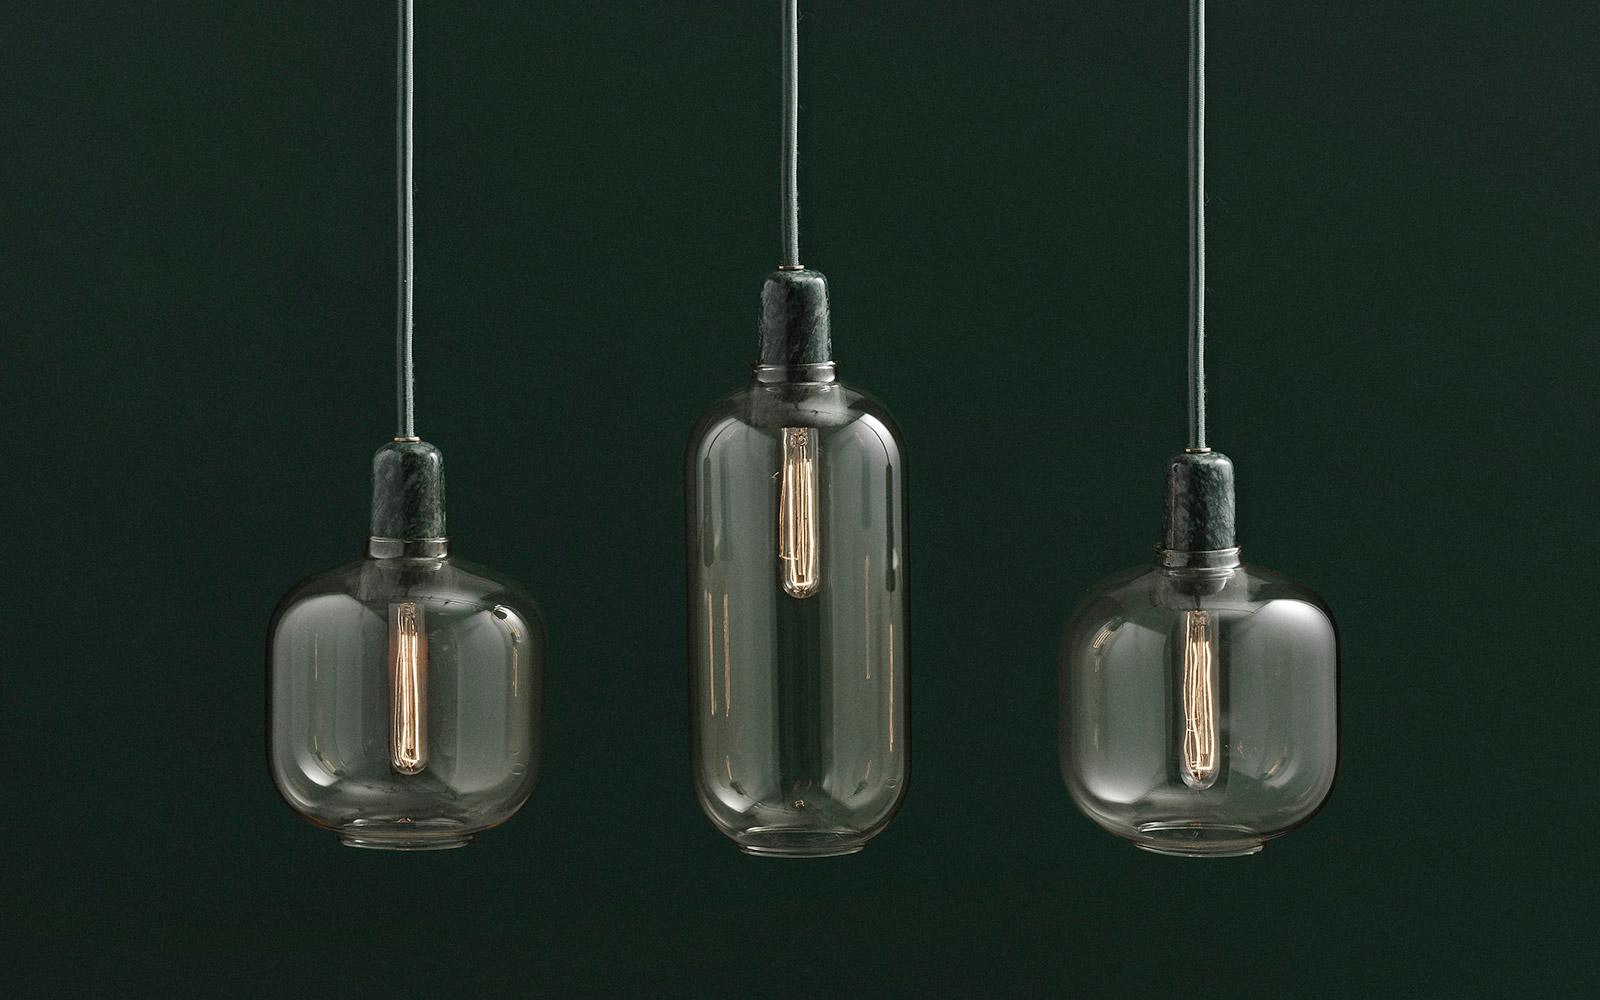 5021_Amp_Lamp_Group_Green_2.ashx